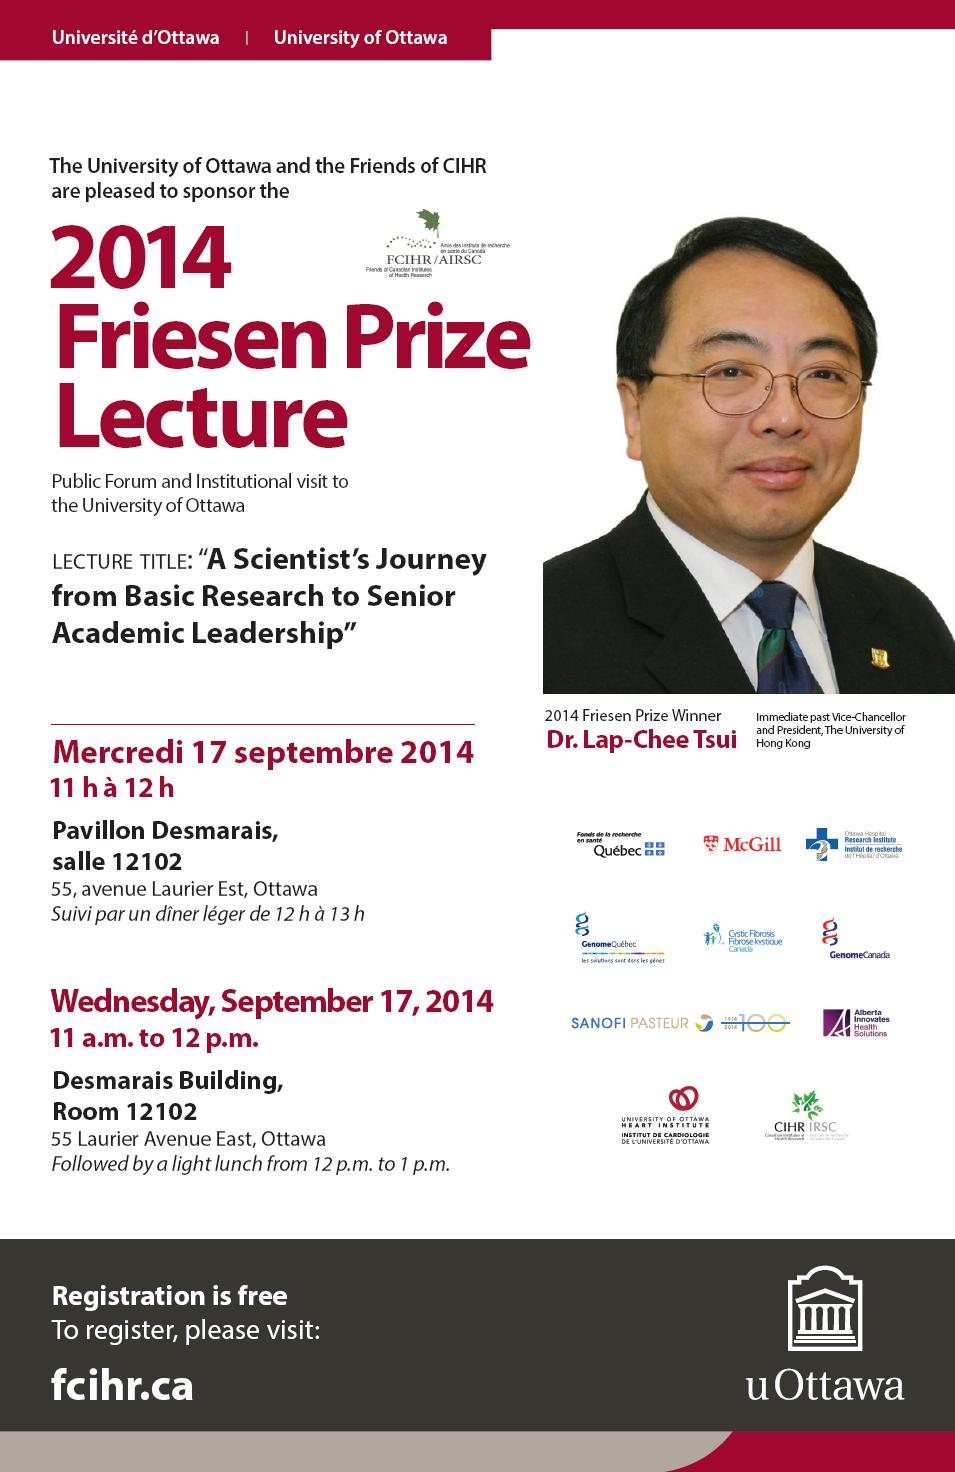 U OTTAWA POSTER - 2014 Friesen Prize Public Forum Lecture - September 17